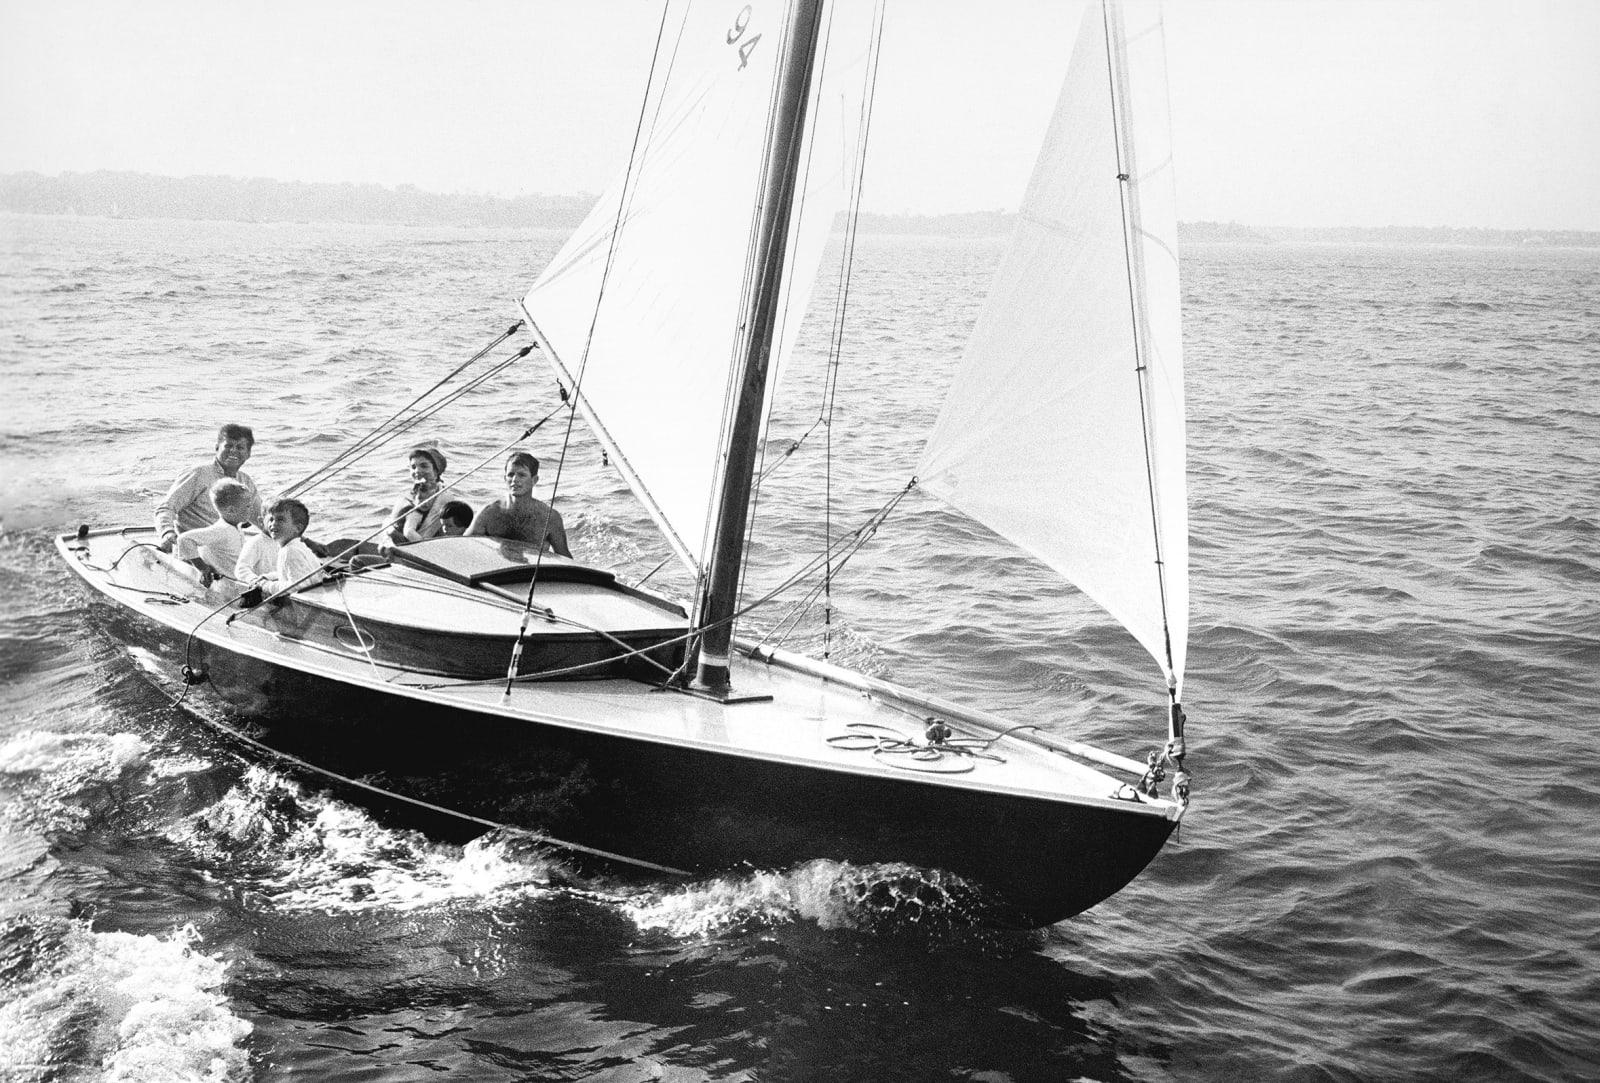 Mark Shaw, Kennedy family sailing on Nantucket Sound, 1959